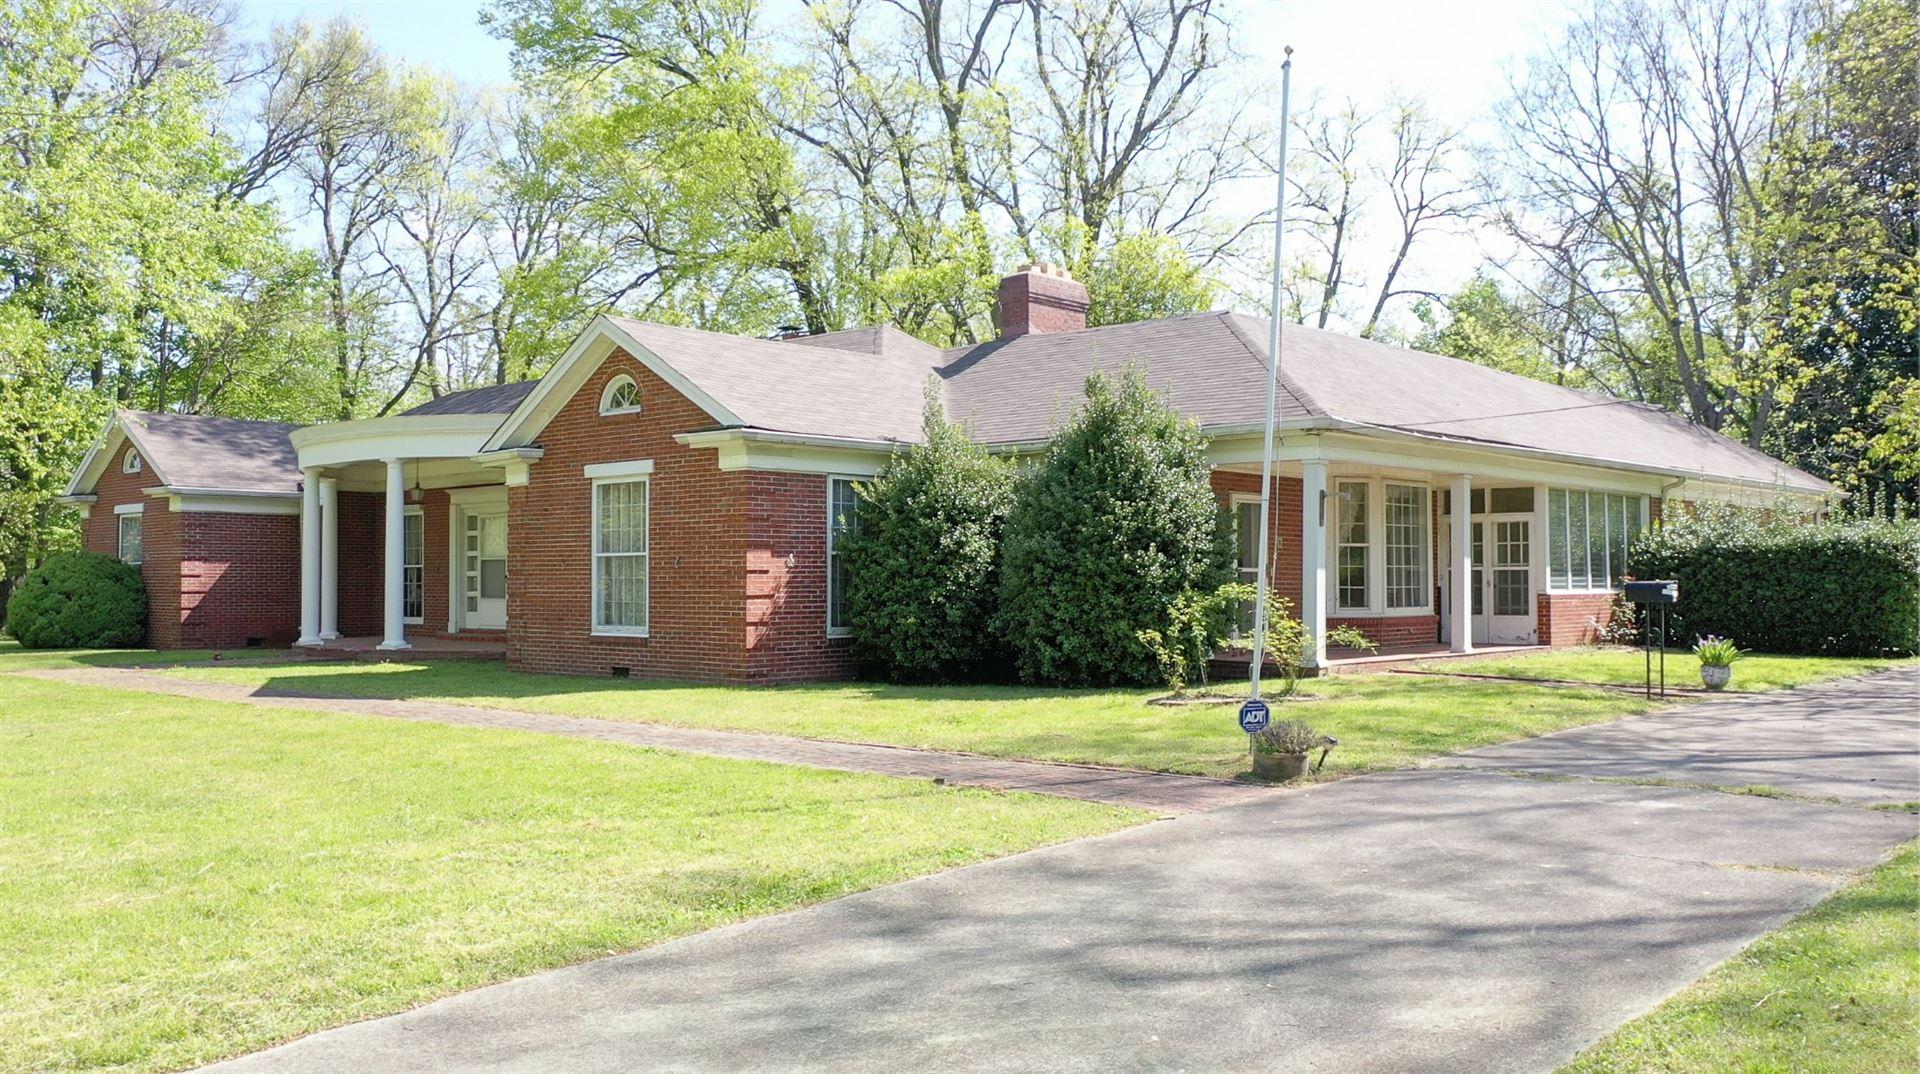 506 Bryant St, Shelbyville, TN 37160 - MLS#: 2248245